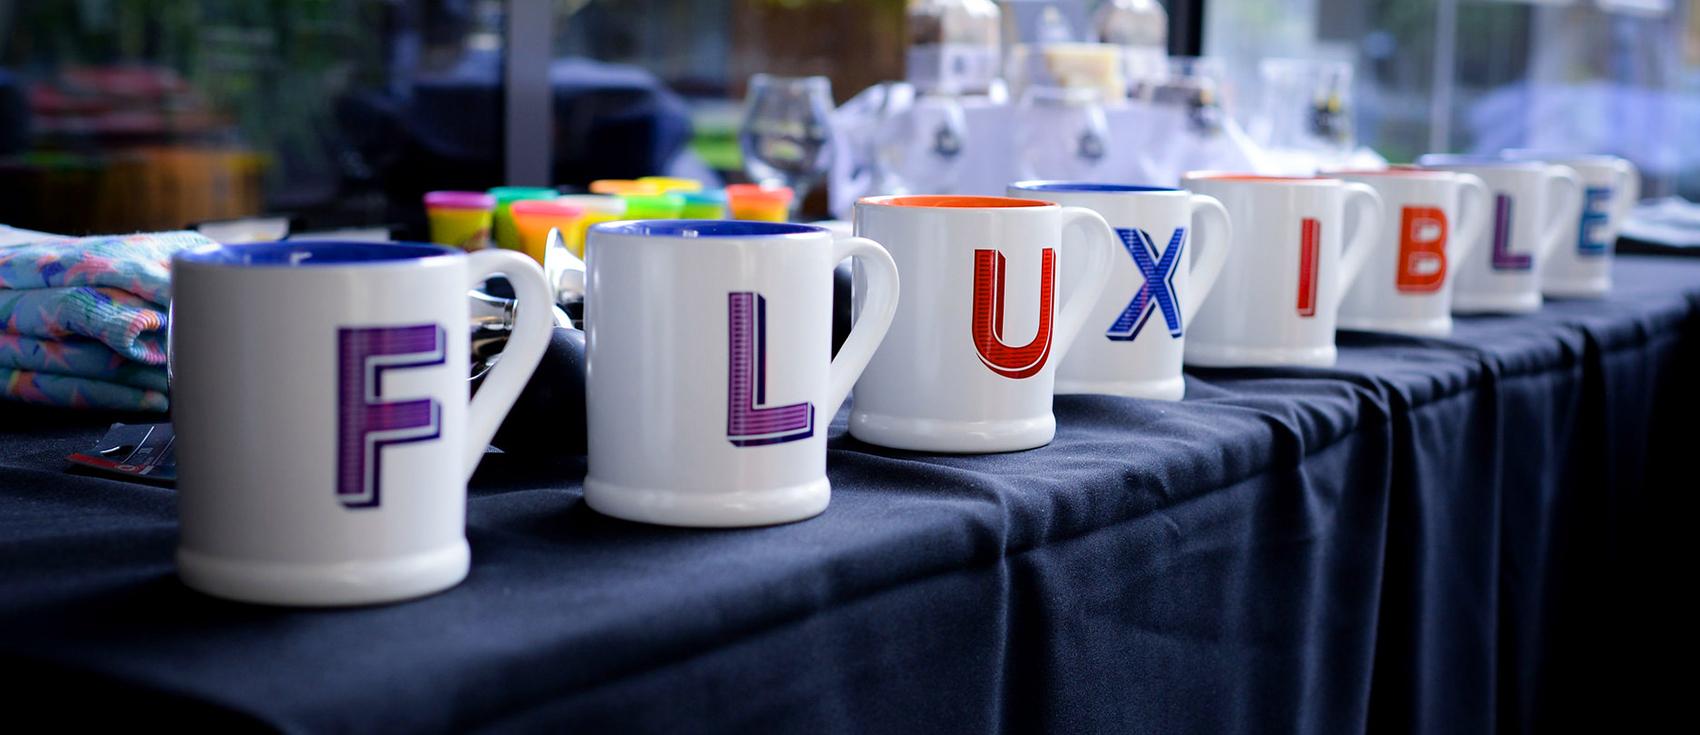 Set of mugs that spell Fluxible